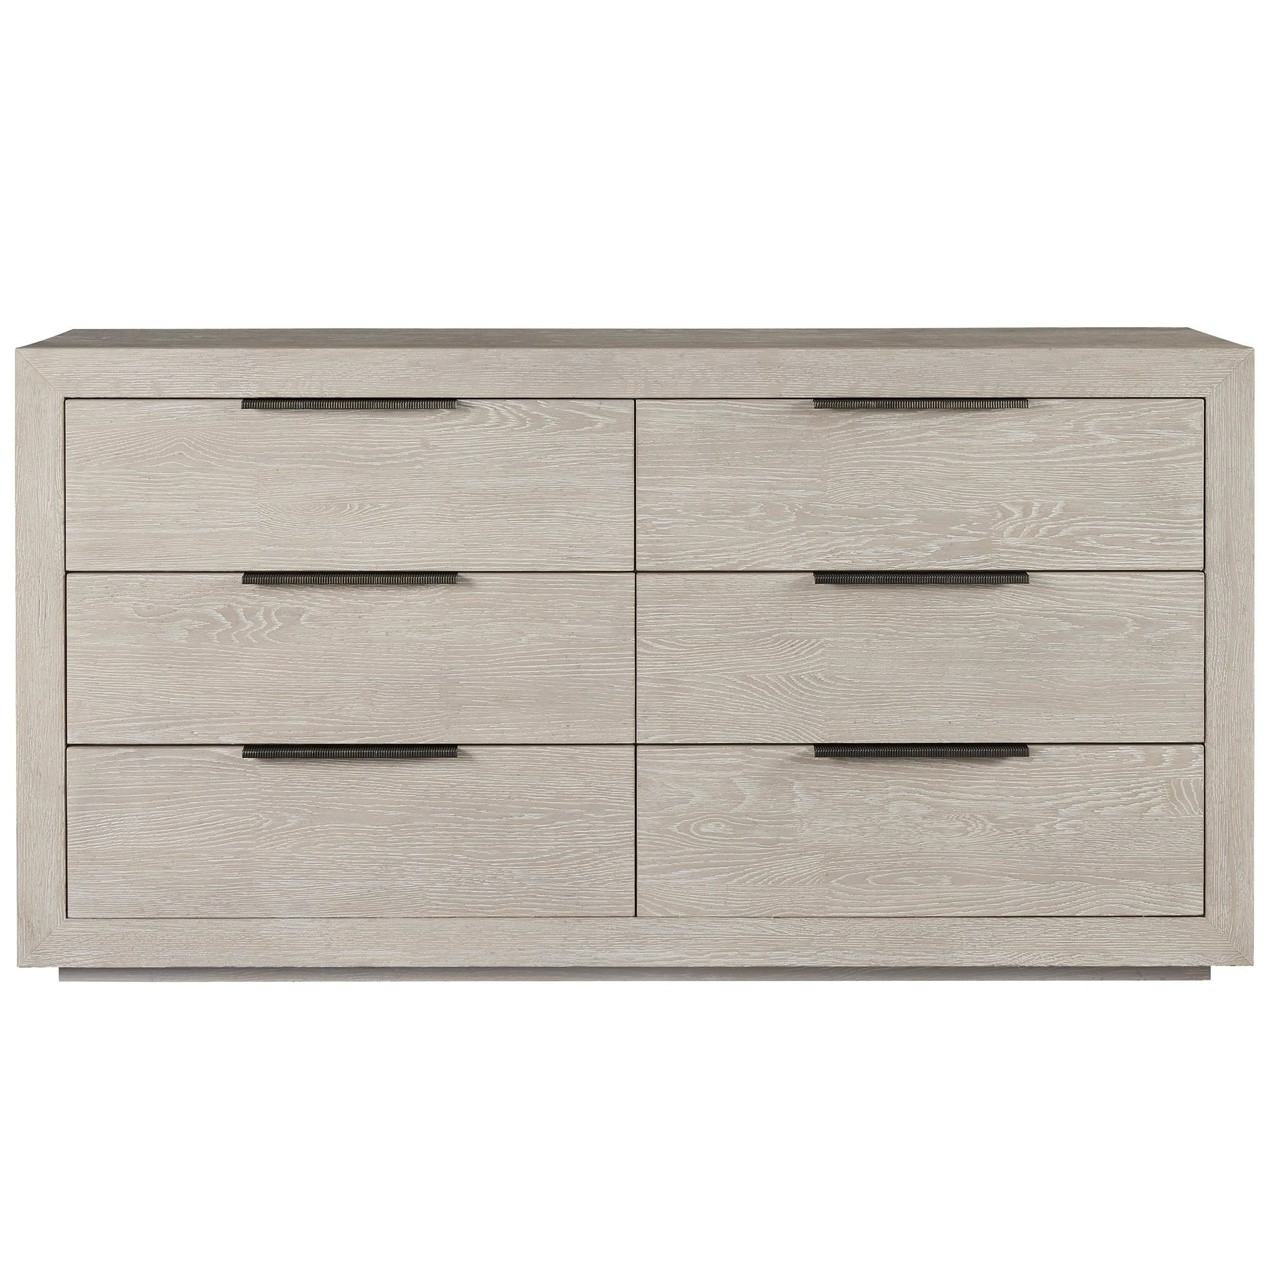 finest selection a3f24 59e9a Modern Grey Oak Huston 6 Drawer Dresser 70